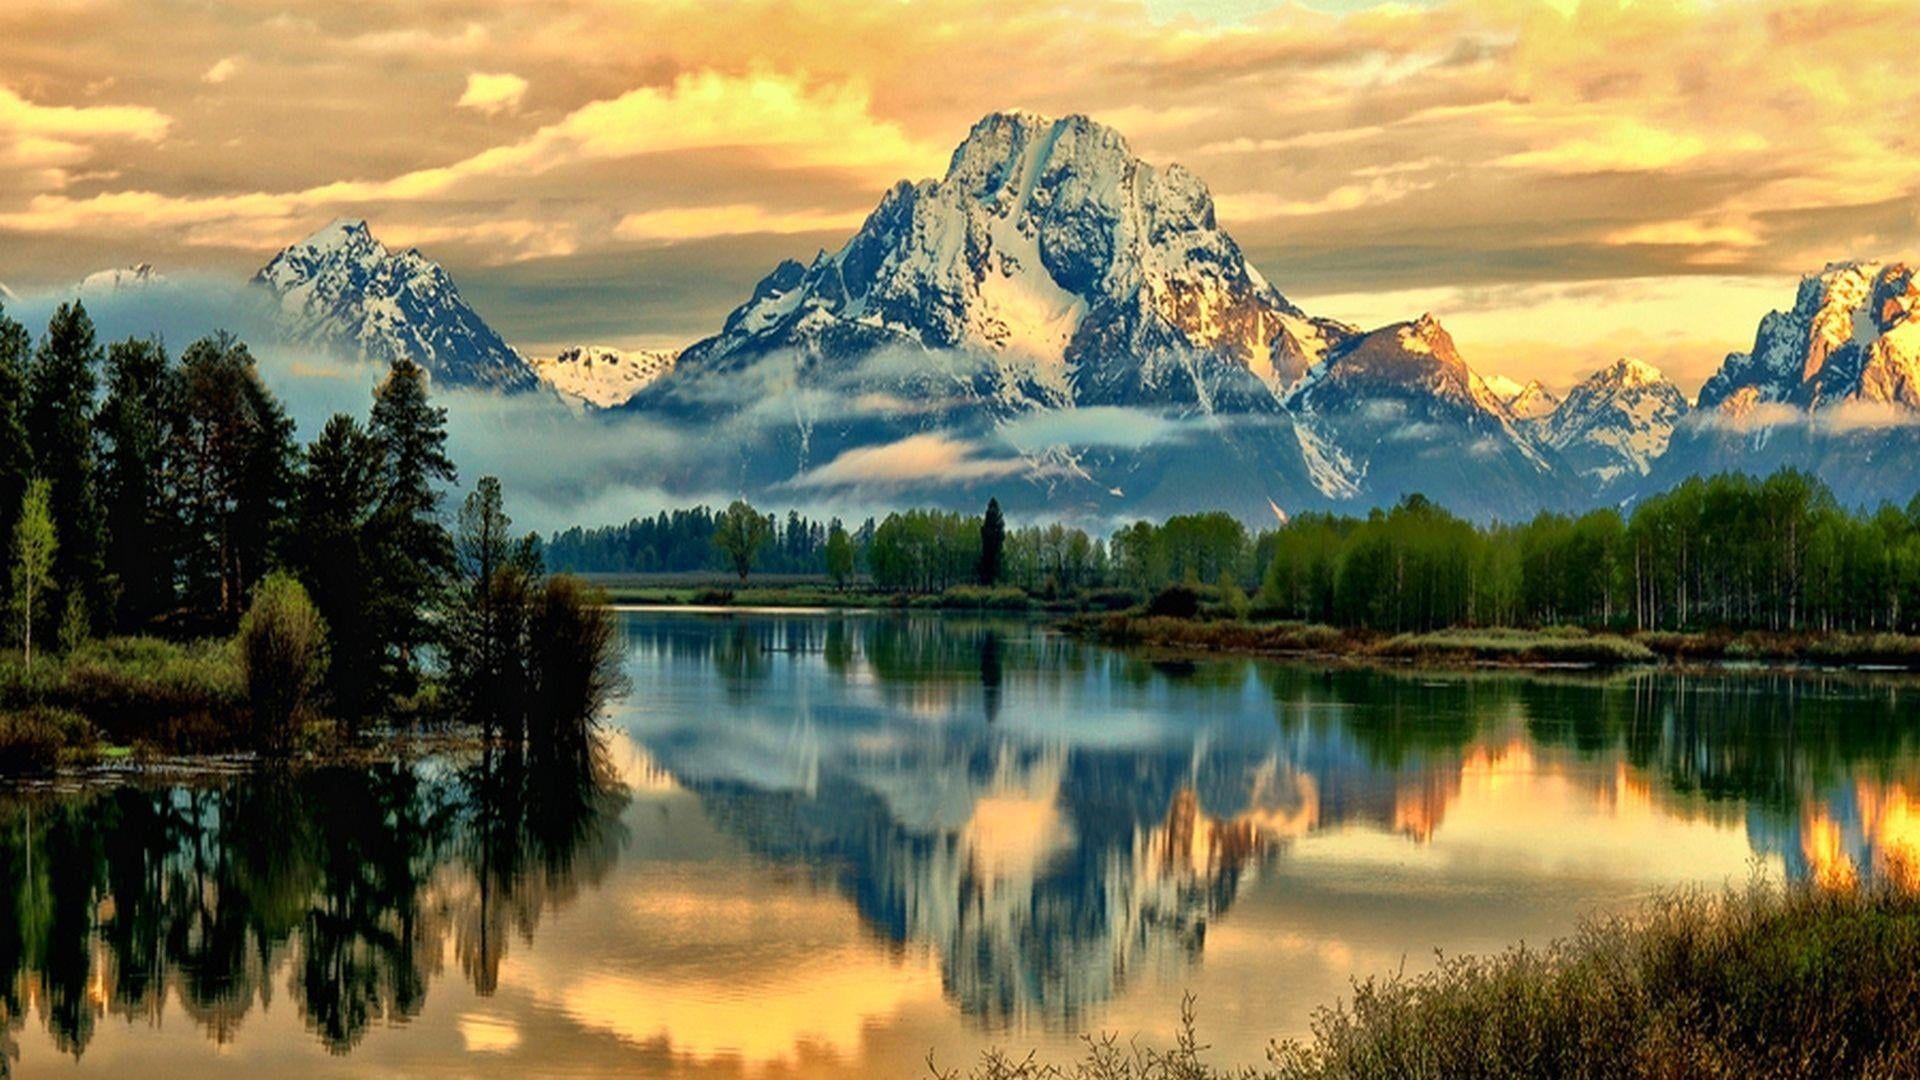 Jackson Lake Mount Moran Grand Teton National Park Wyoming United States Mountain Reflected Lak In 2020 Grand Teton National Park Beautiful Landscapes Grand Tetons